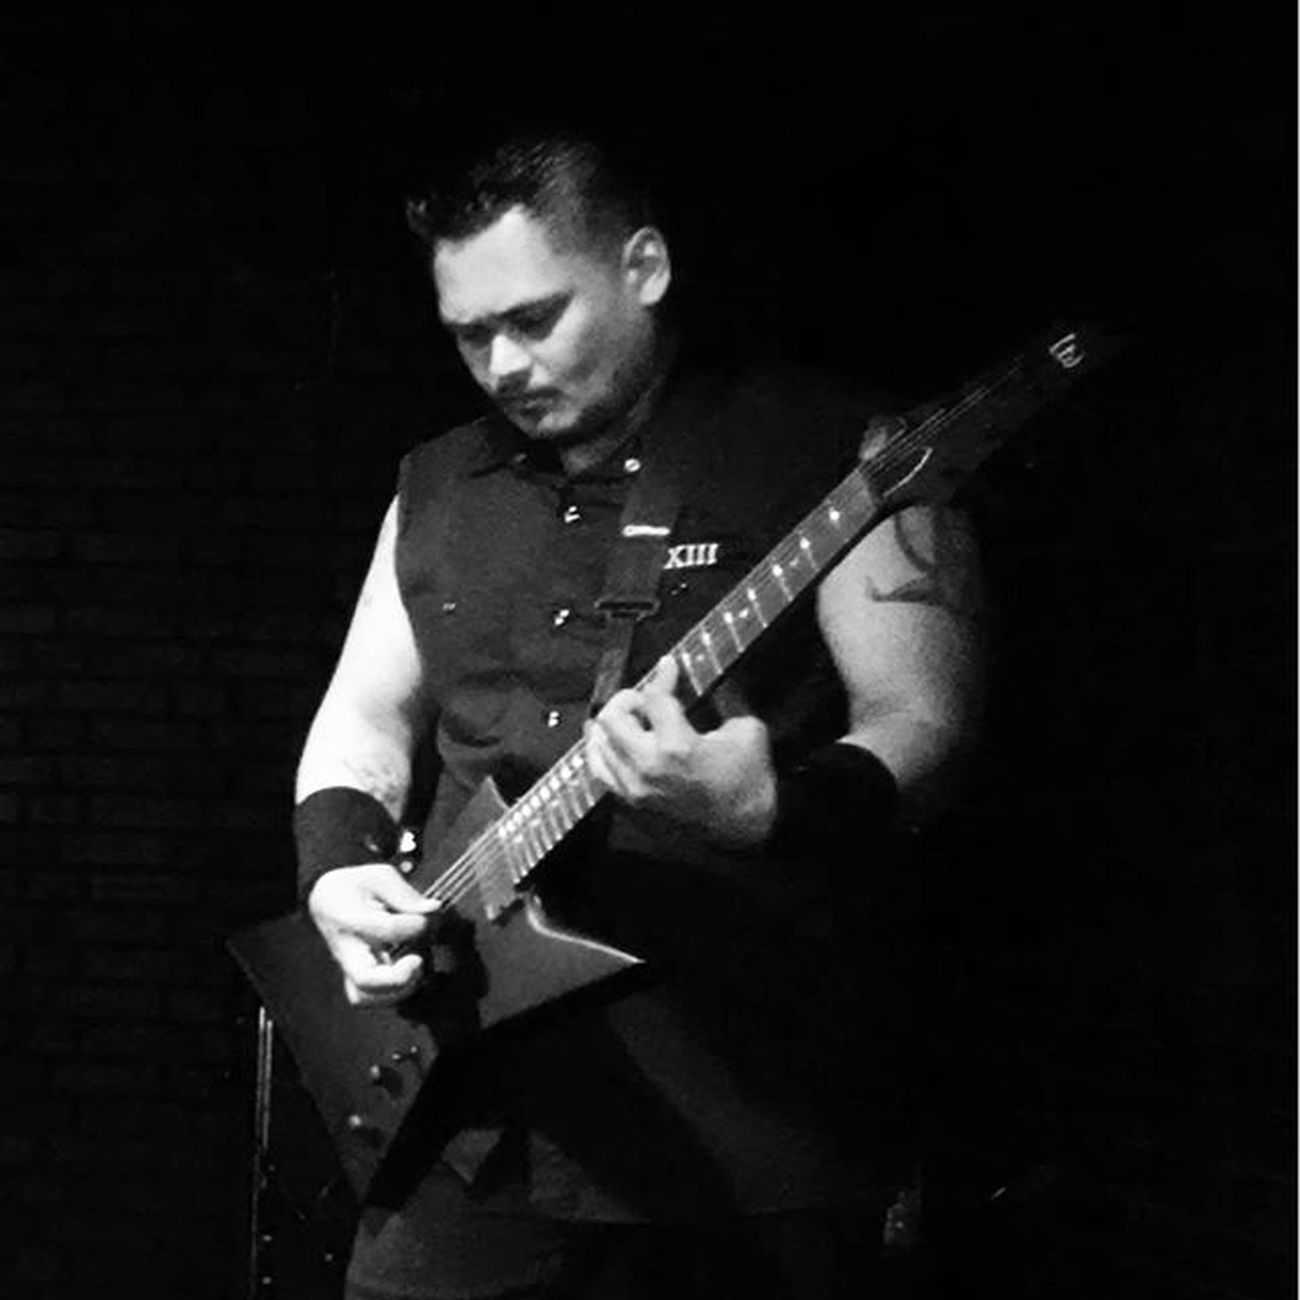 Bandleader Leadguitarists Leadguitar Founder bandfounder producer menofmetal metalguys liveguitarist liveguitar metalguitar metalproducer espguitars metalheadsofinstagram instaguitar instametalheads instametal playingguitar livemetal